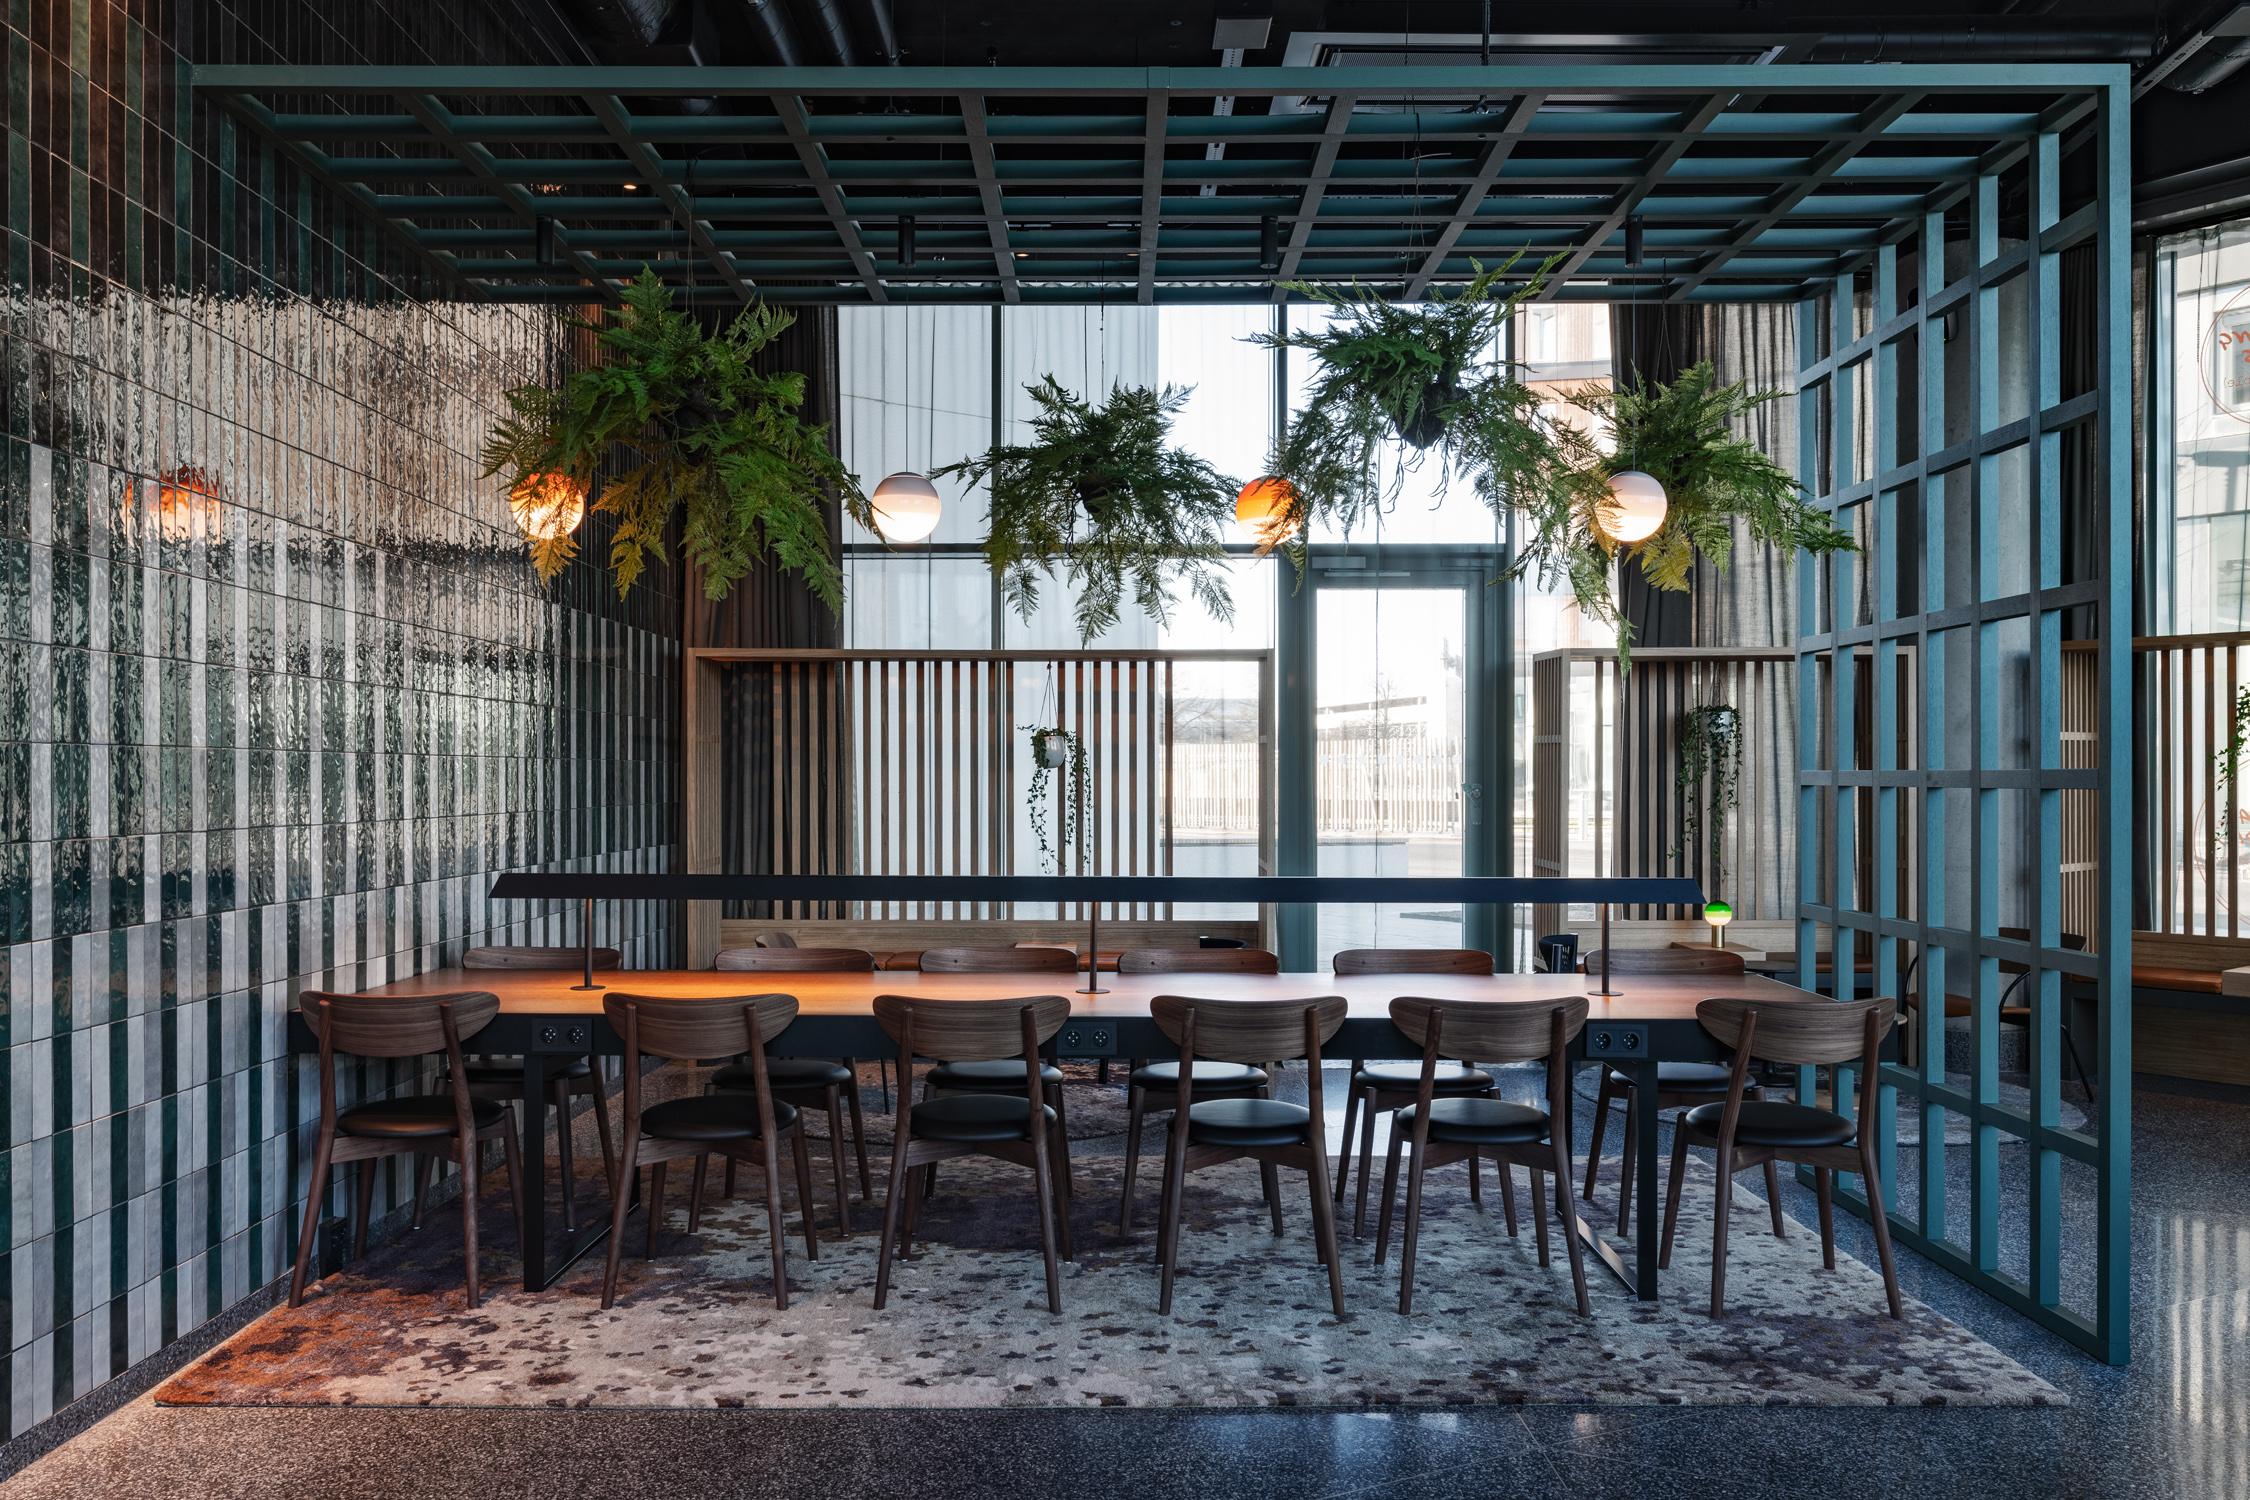 003_comfort_hotel_arlanda_lounge_area